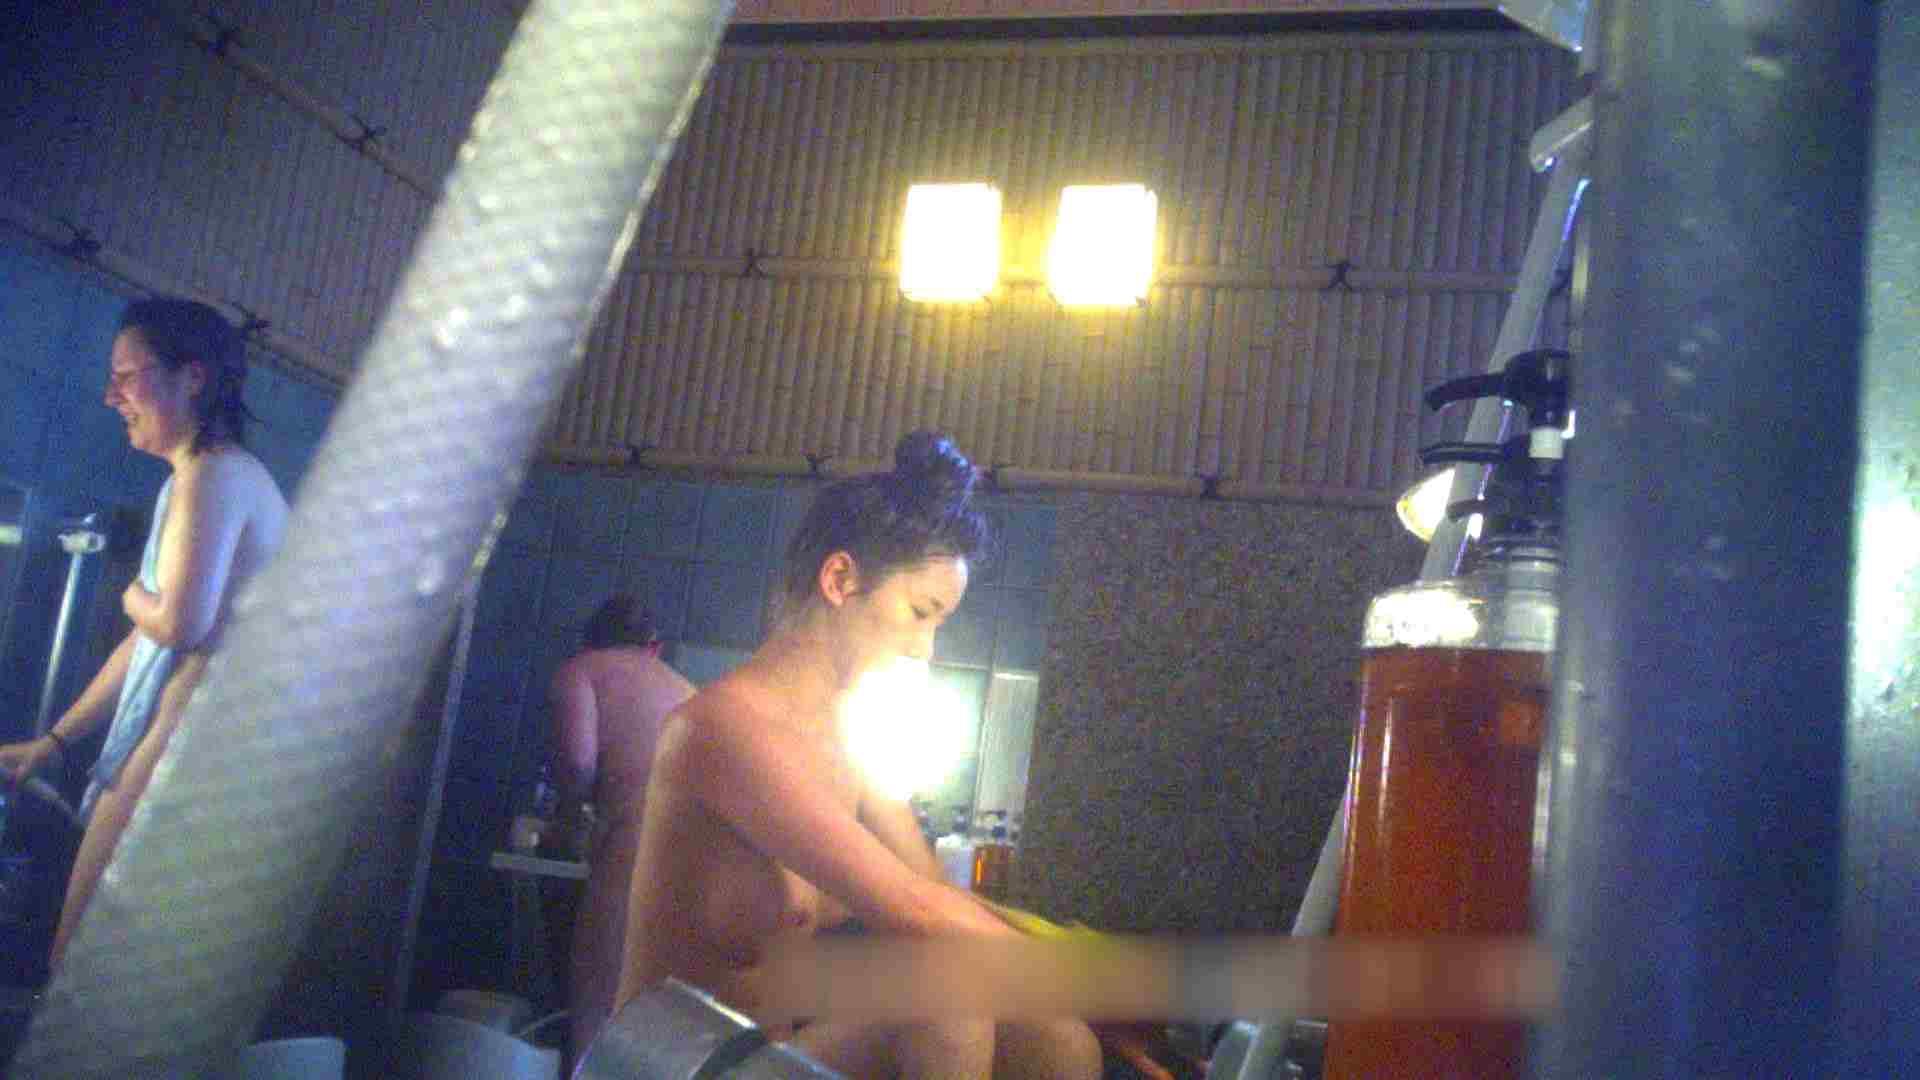 TG.15 【上等兵】高級旅館の爆乳女将で有名っぽい 潜入 隠し撮りAV無料 81pic 56